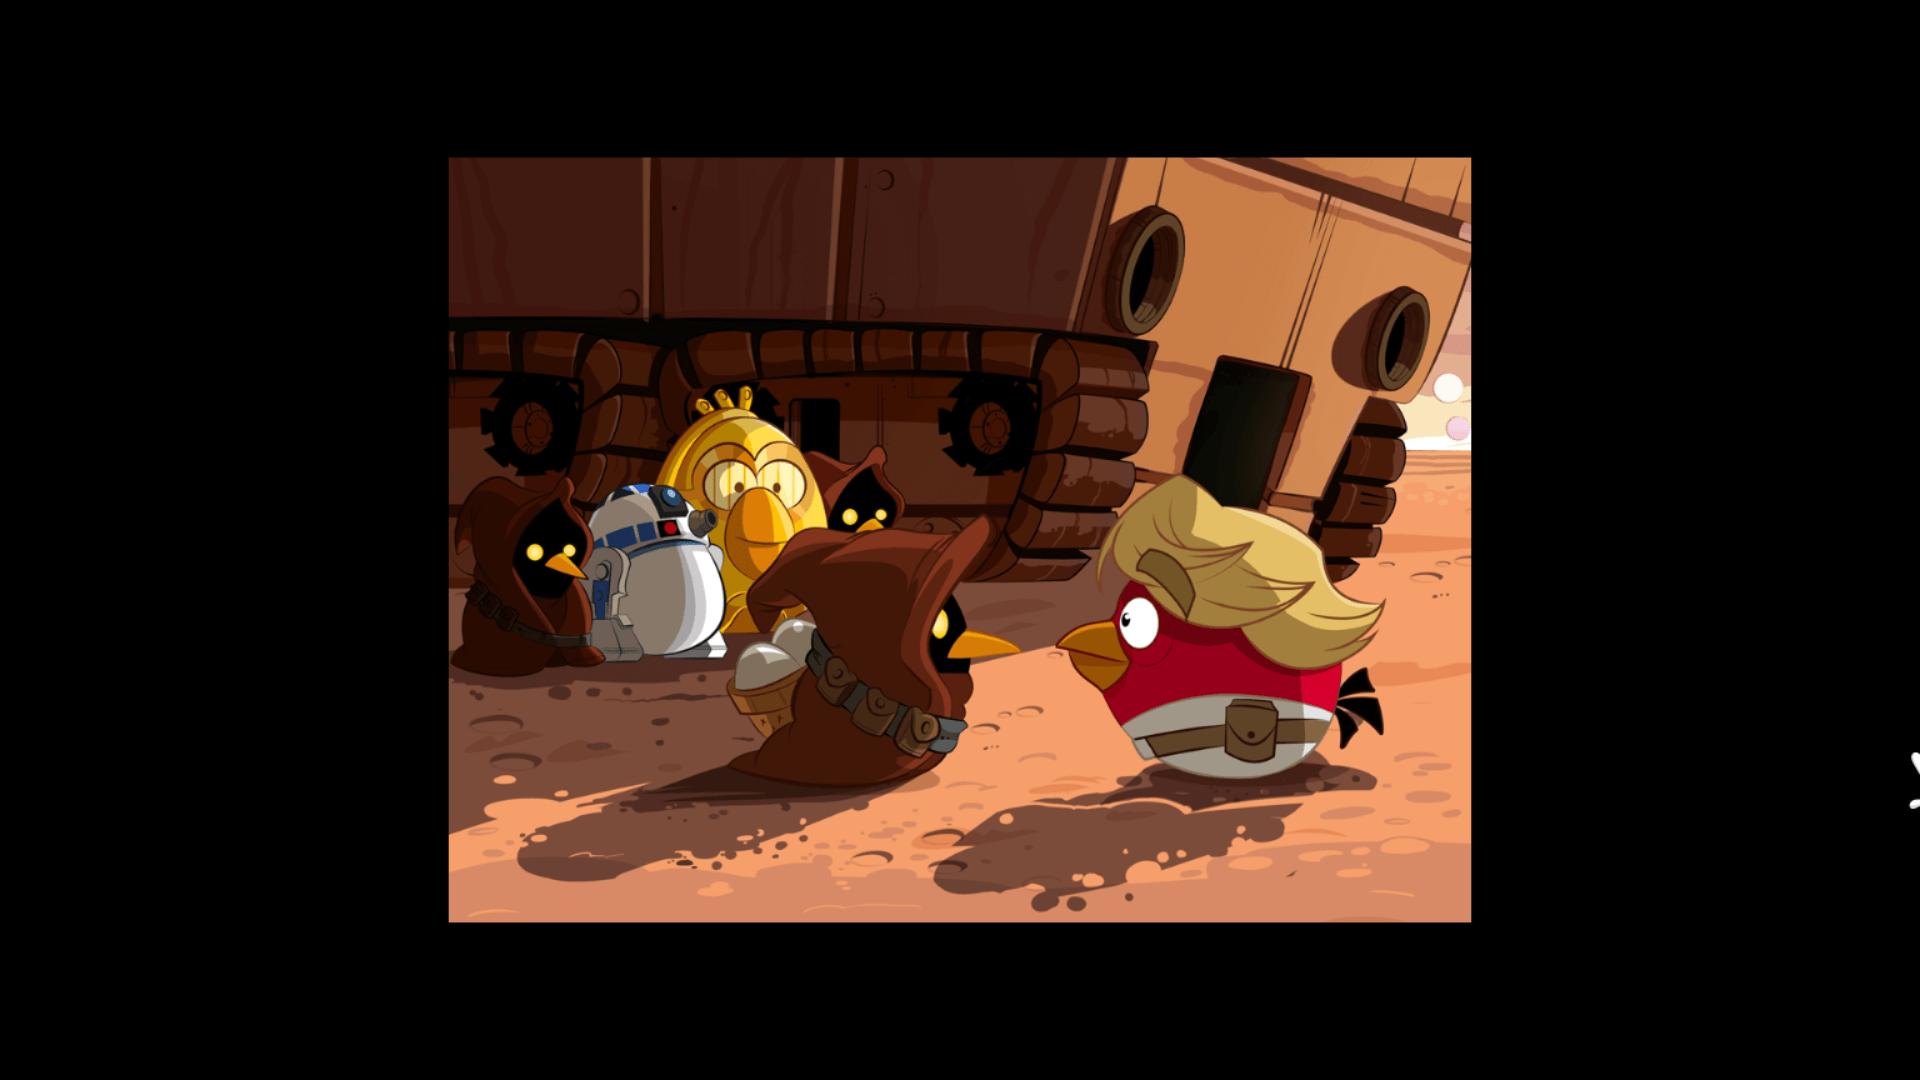 Angry Birds cartoon storyline